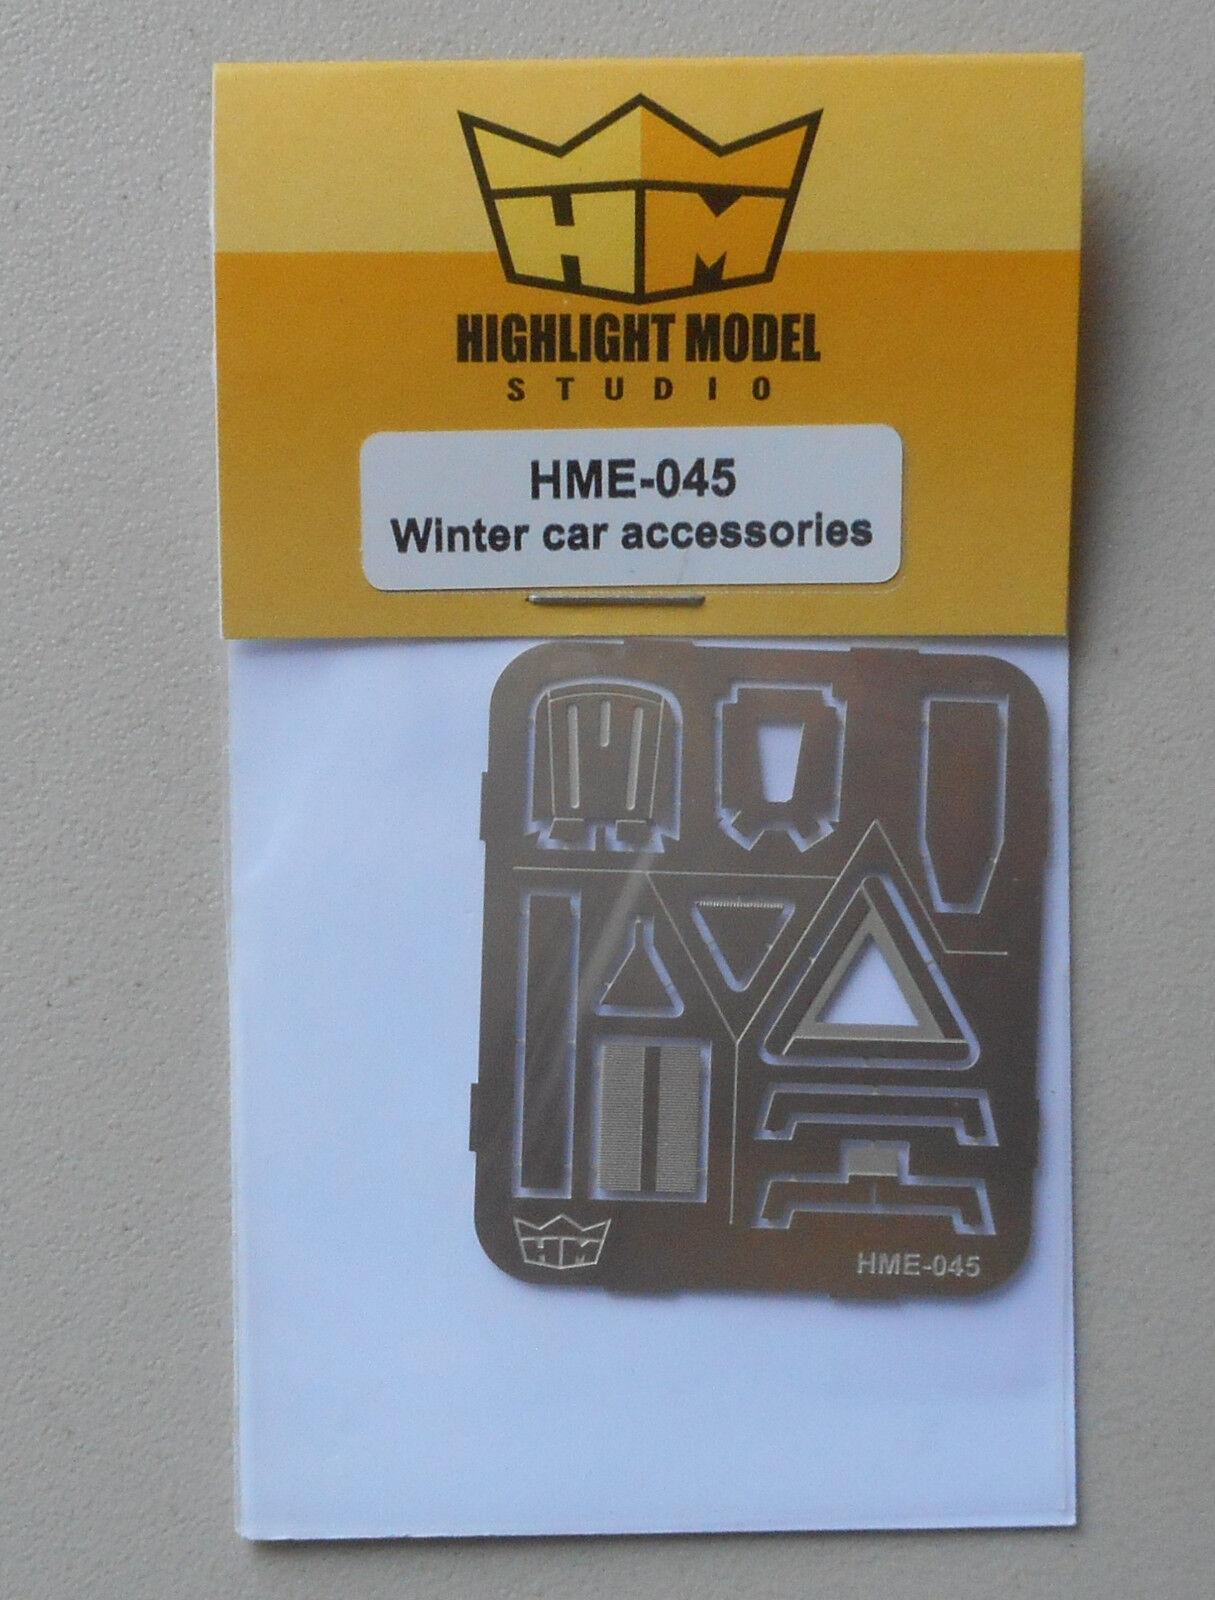 1 24 1 25 winter car accessories